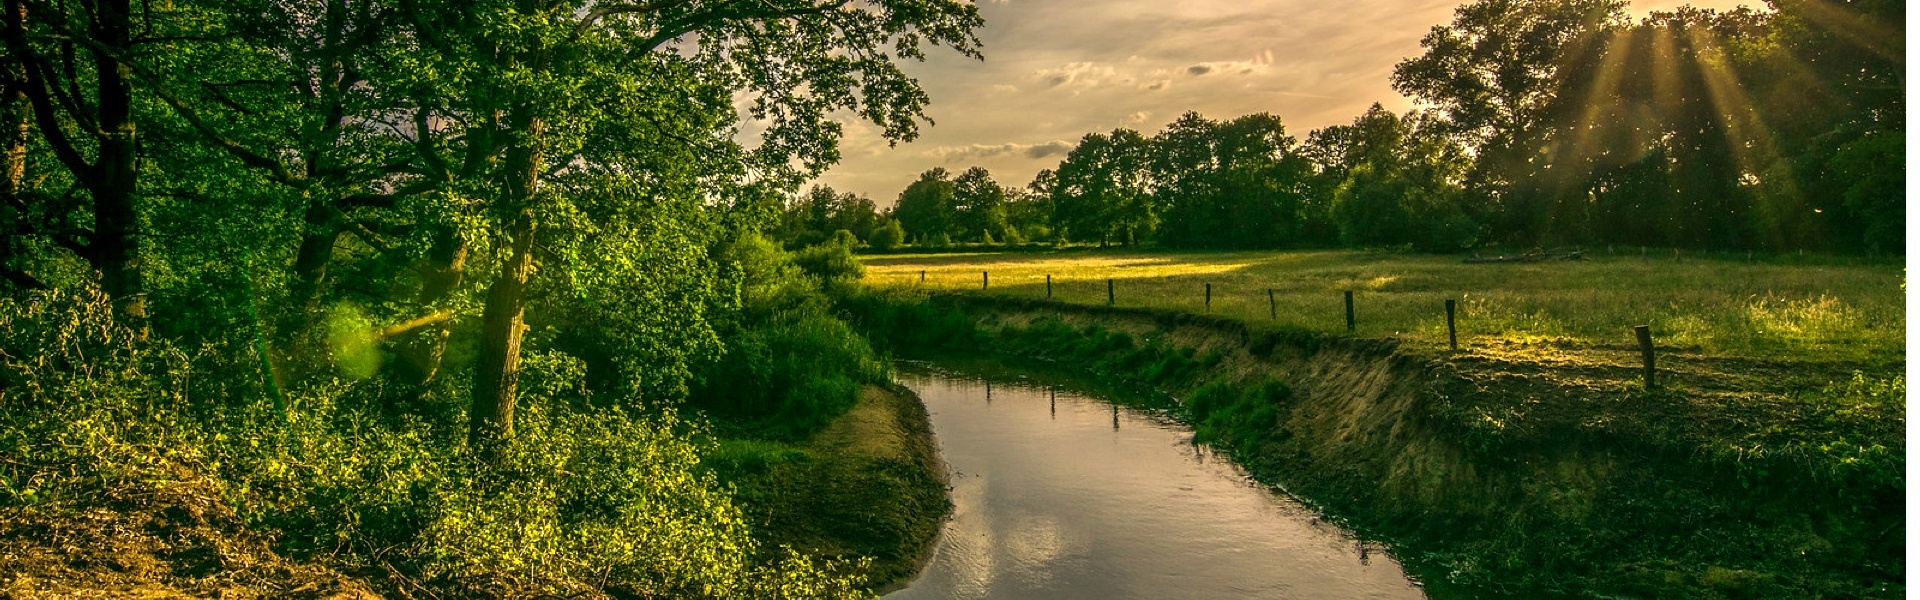 Nederland | Wandelvakantie Twente